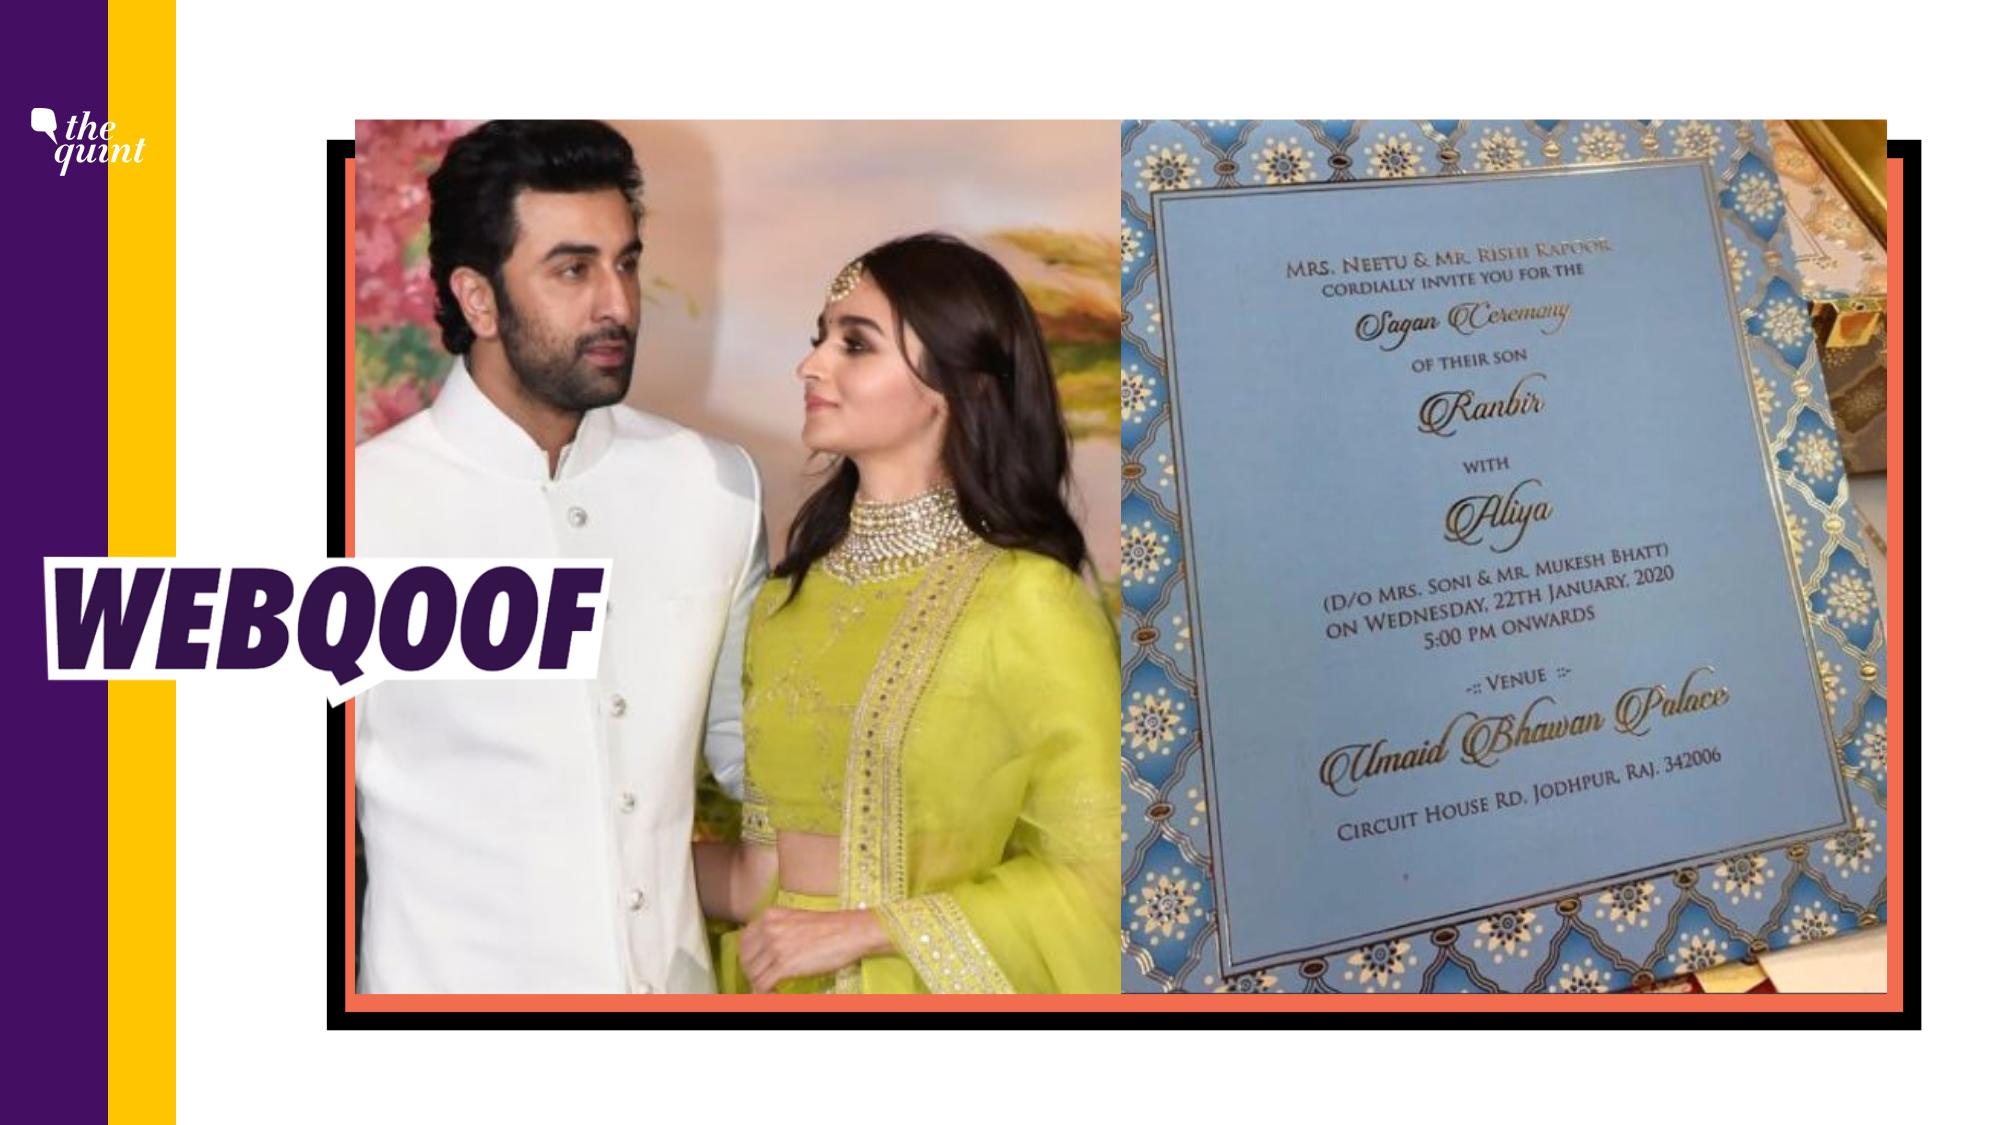 Ranbir and Alia Tying the Knot on 22 January 2020? It's Fake News